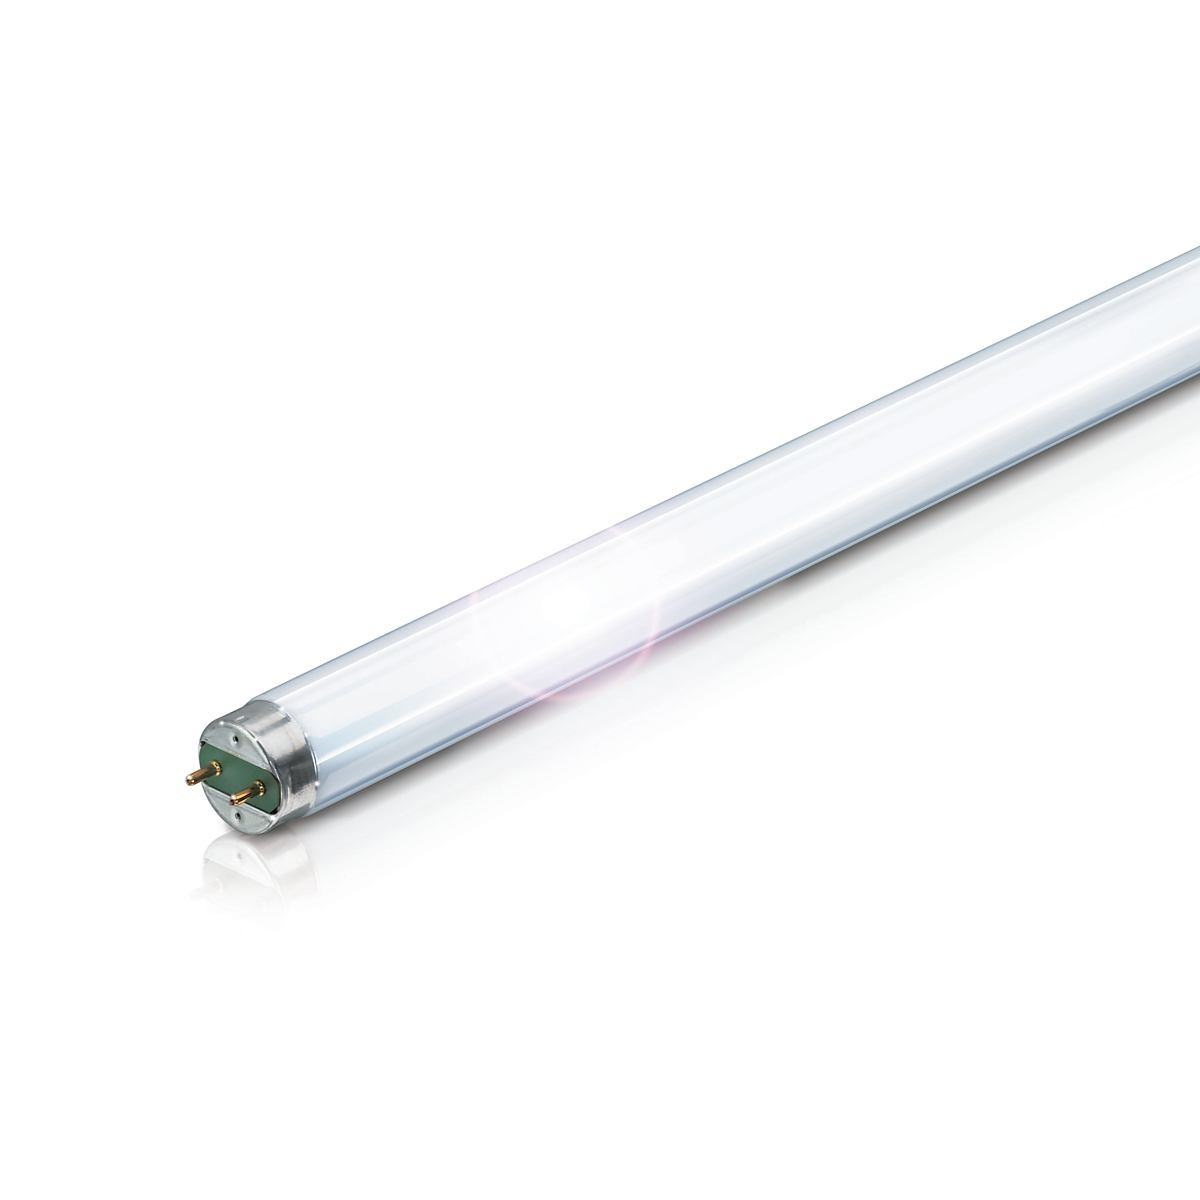 Tl Lamp 18 W 60 Cm Kleur 830 Warm Wit Rebulb Be